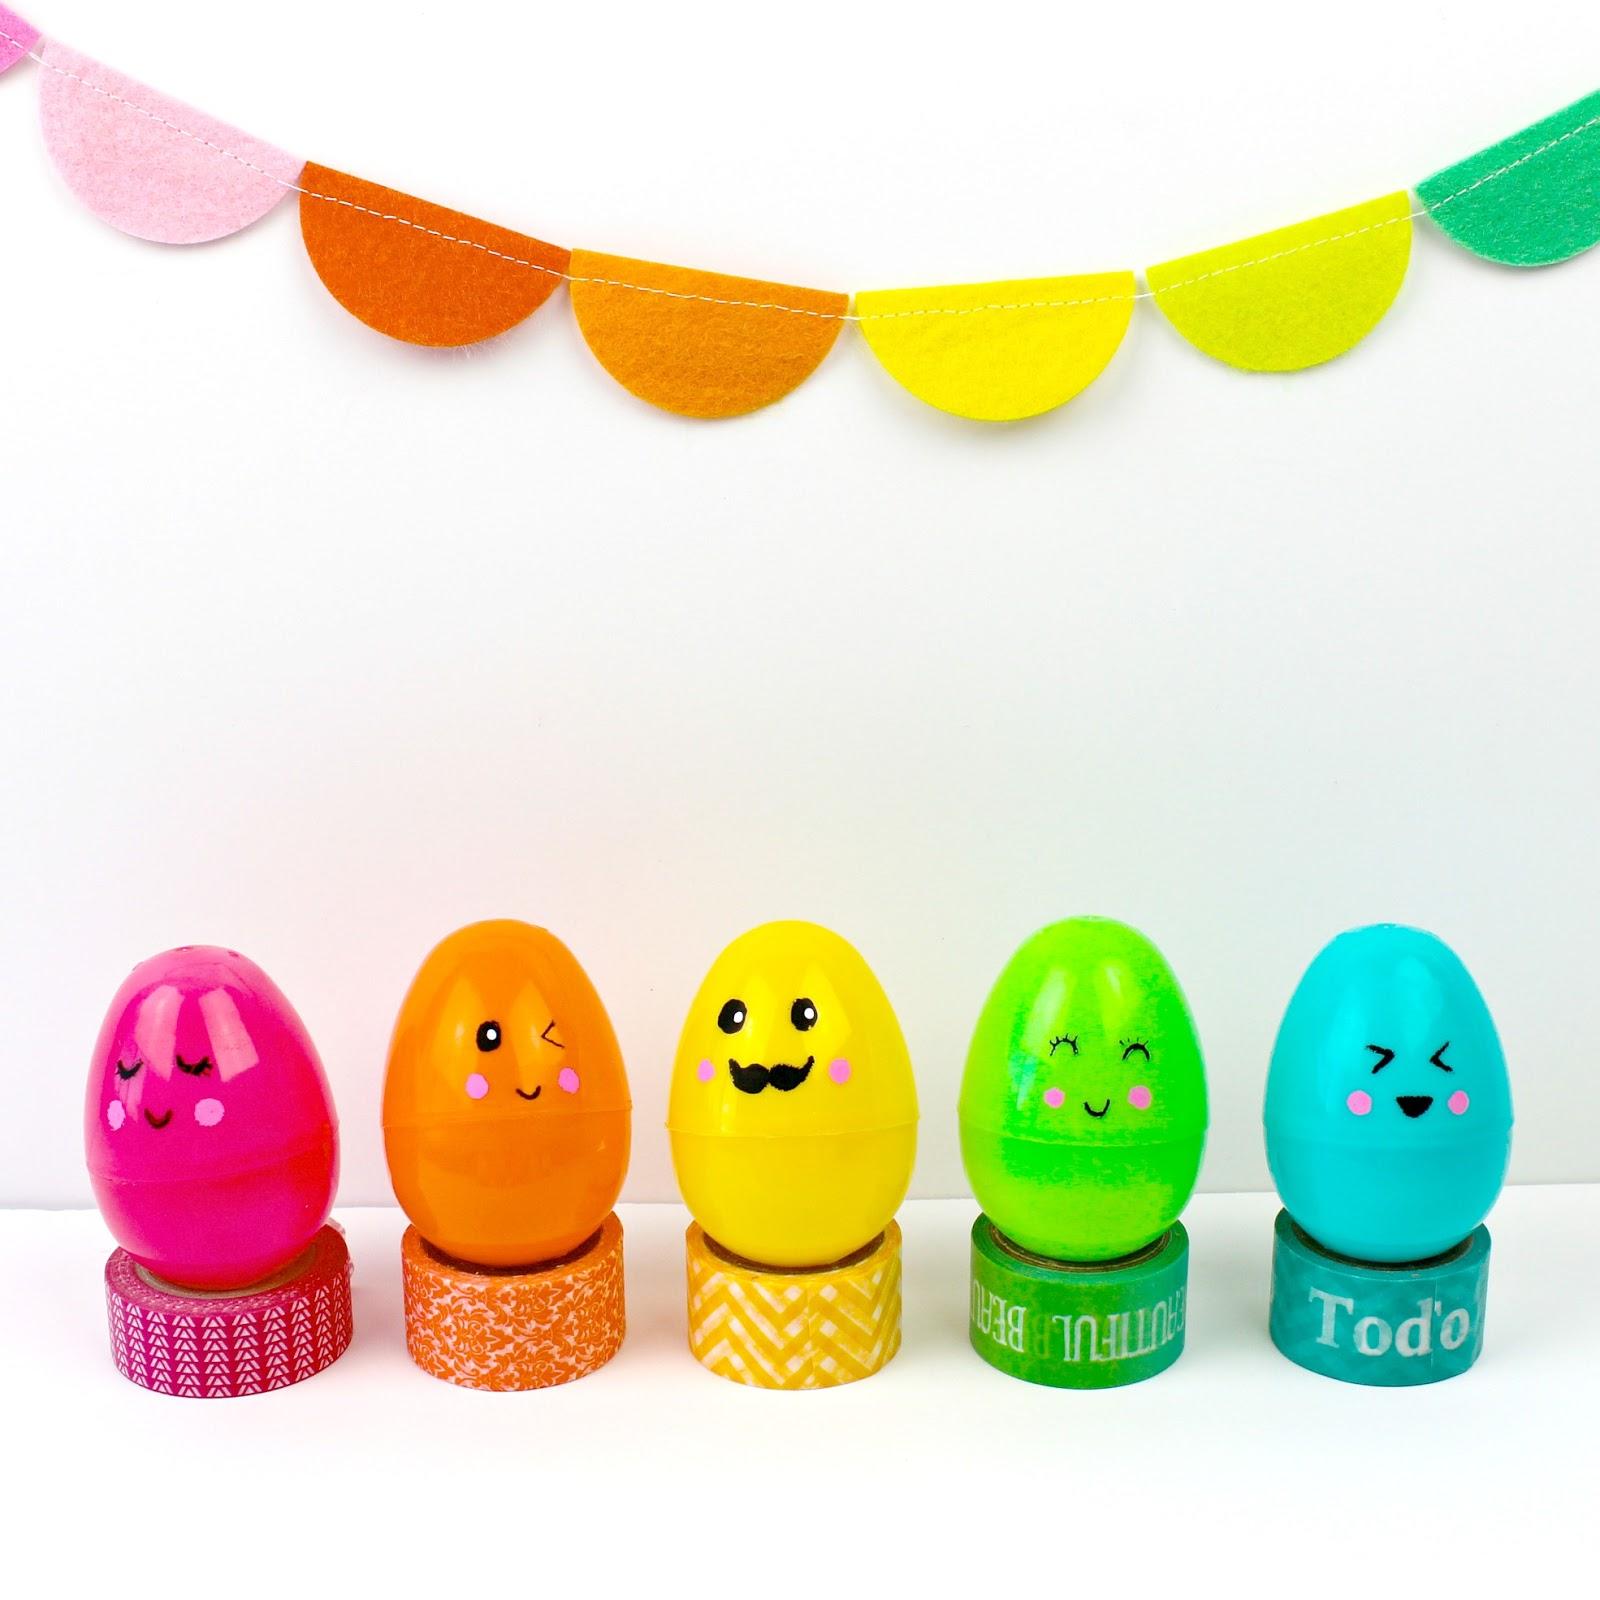 Diy Kawaii And Emoji Inspired Easter Eggs Color Made Happy